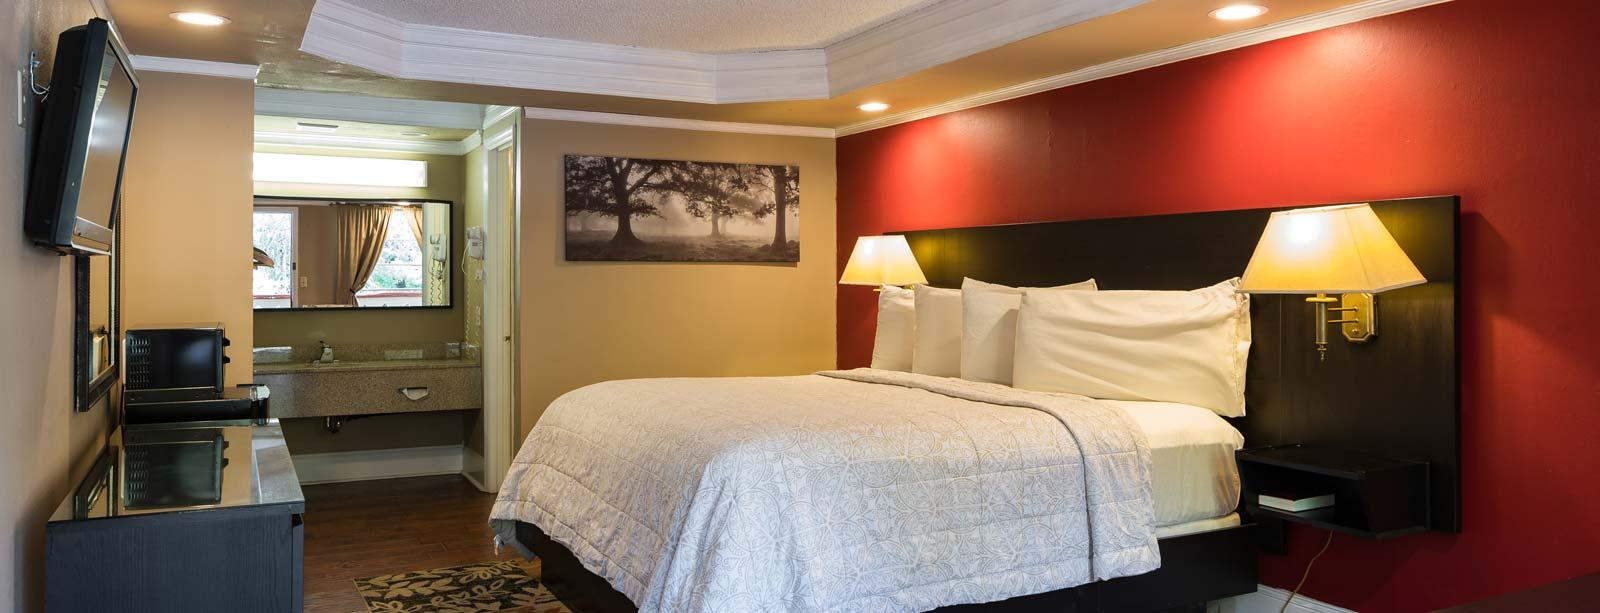 The Riverbend Hotel and Cabins, Georgia